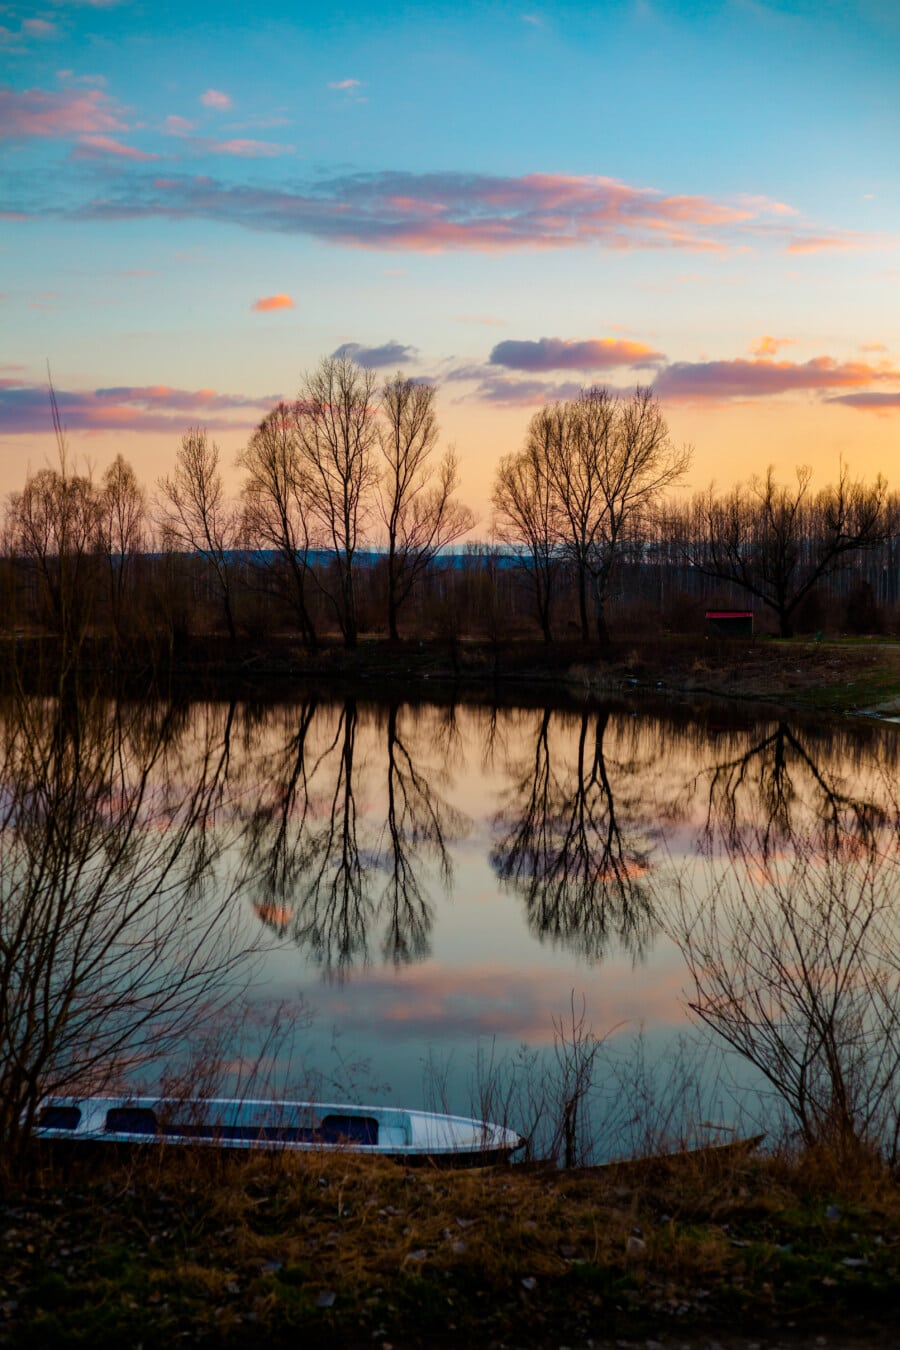 twilight, lake, sunset, tree, water, landscape, dawn, sun, reflection, nature